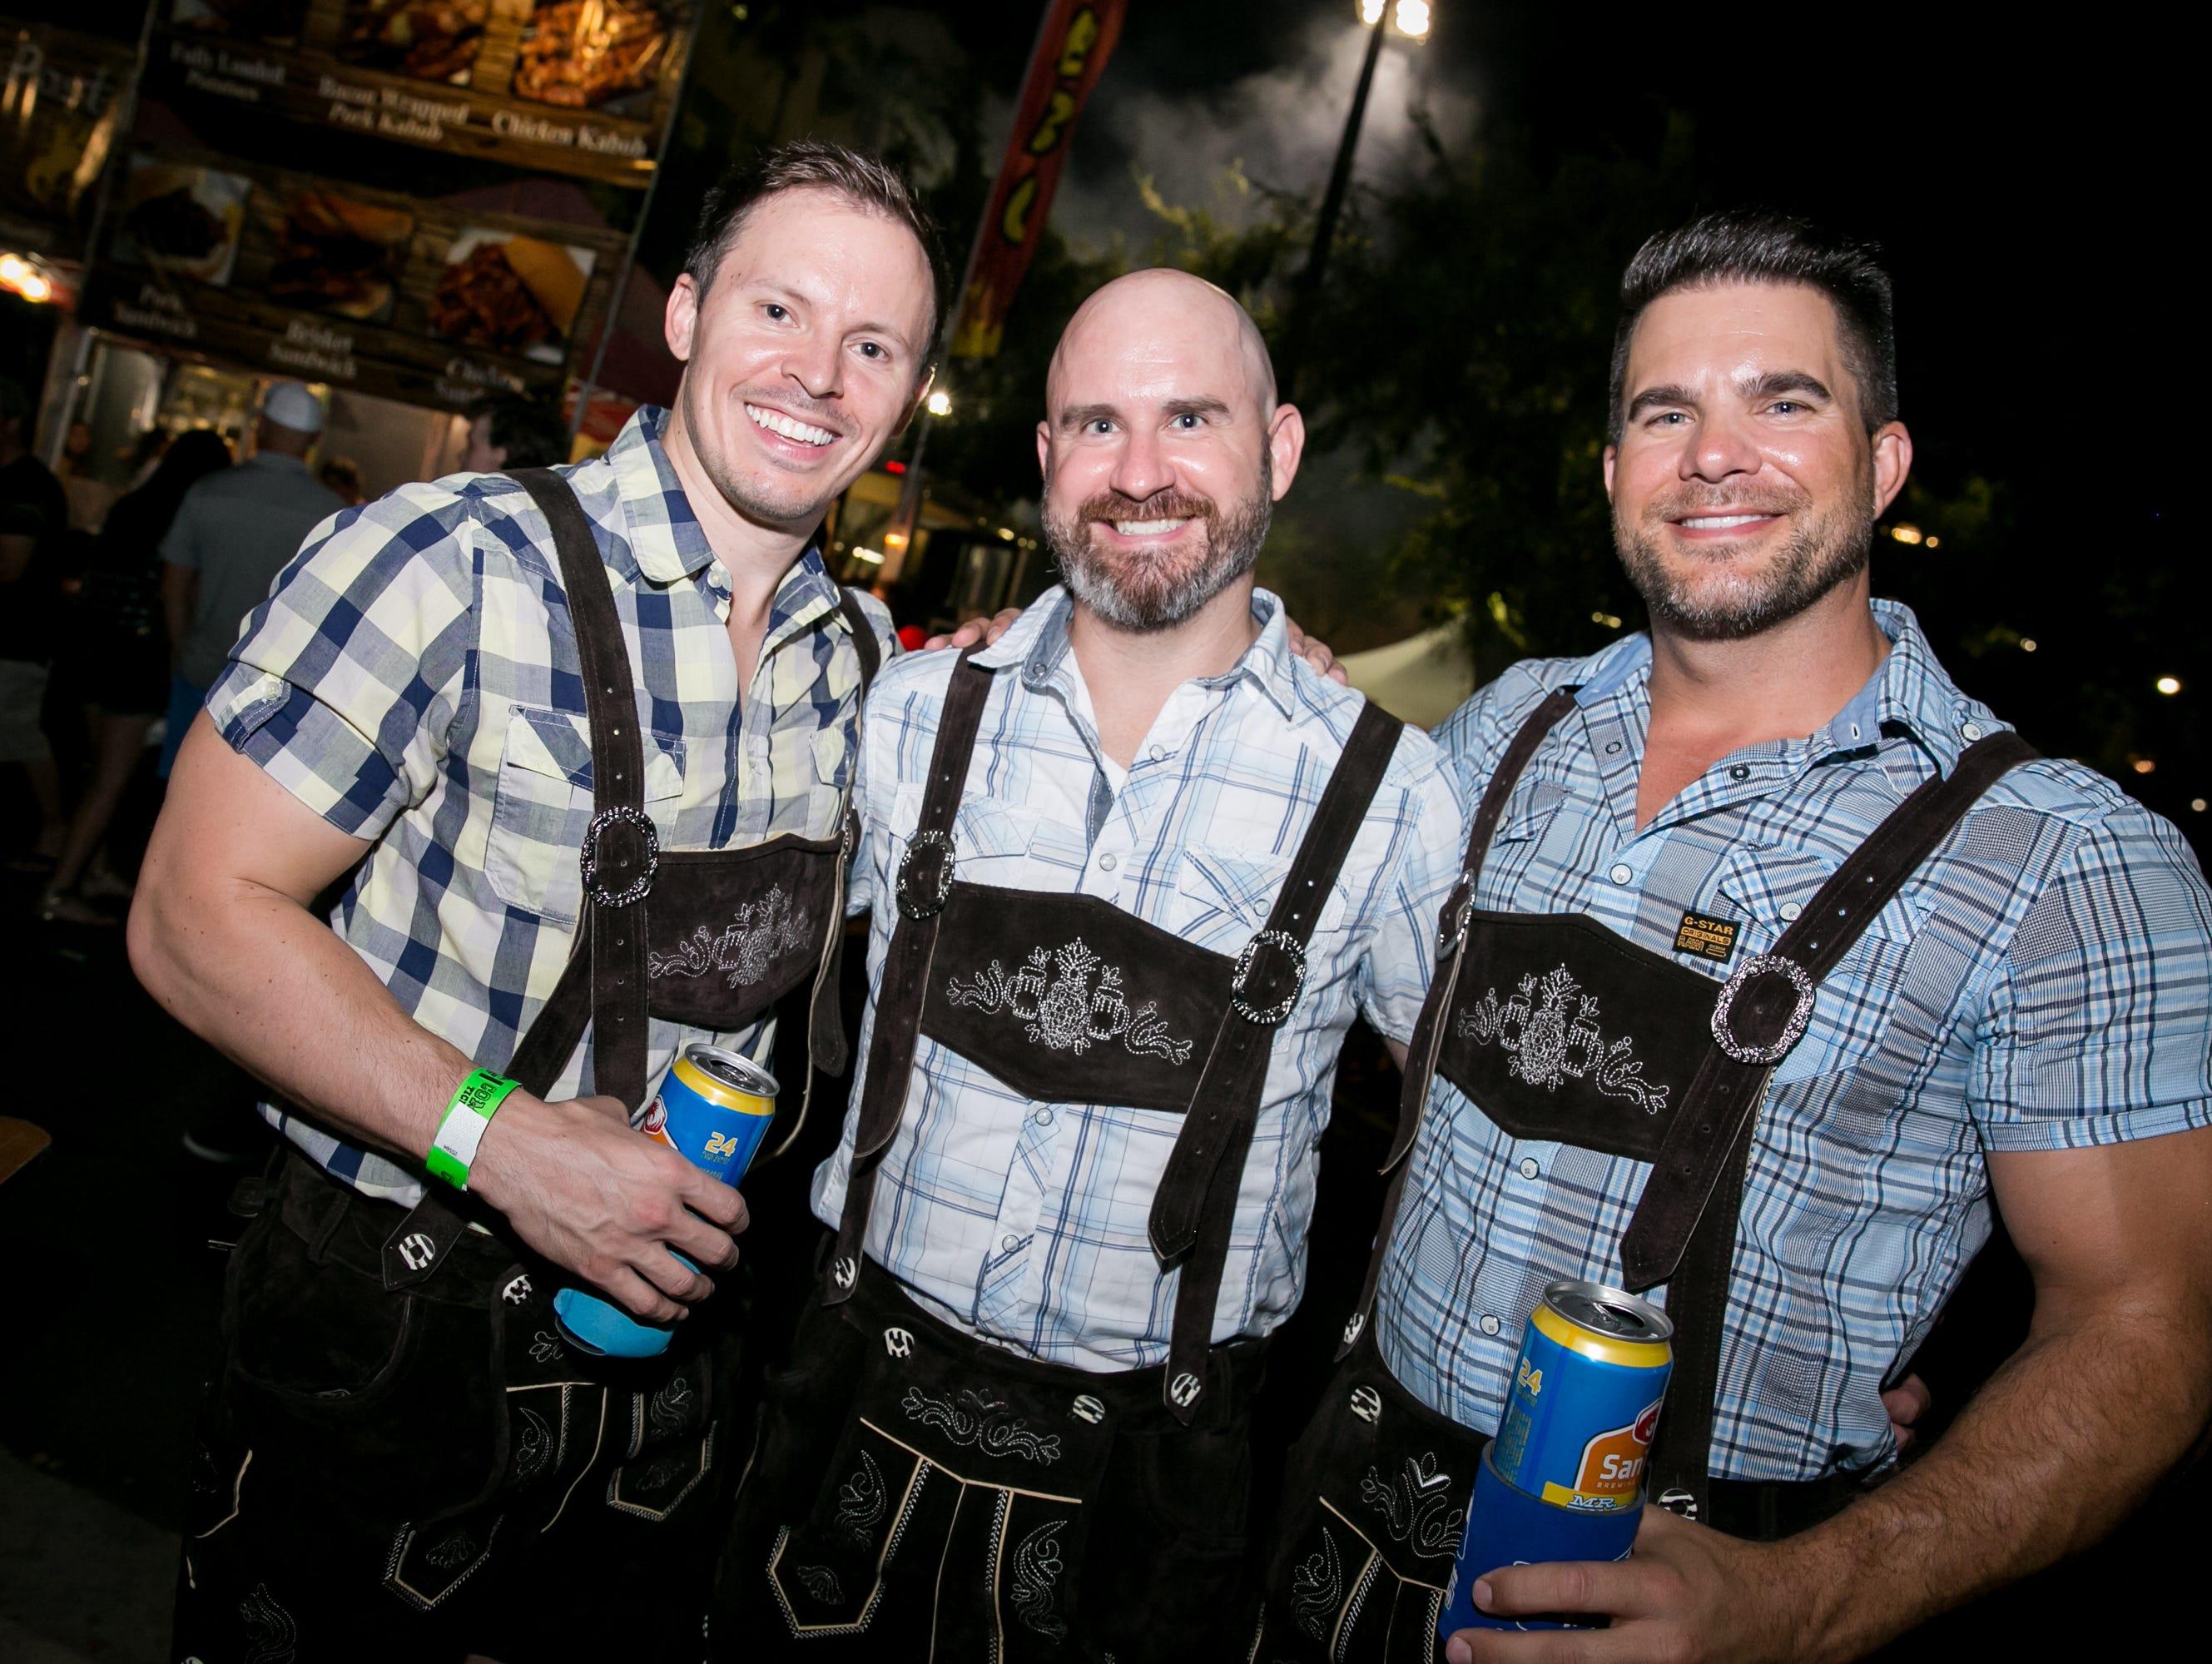 Lederhosen was a must during SanTan Brewing Oktoberfest at Dr. AJ Chandler Park in Chandler on Saturday, September 29, 2018.